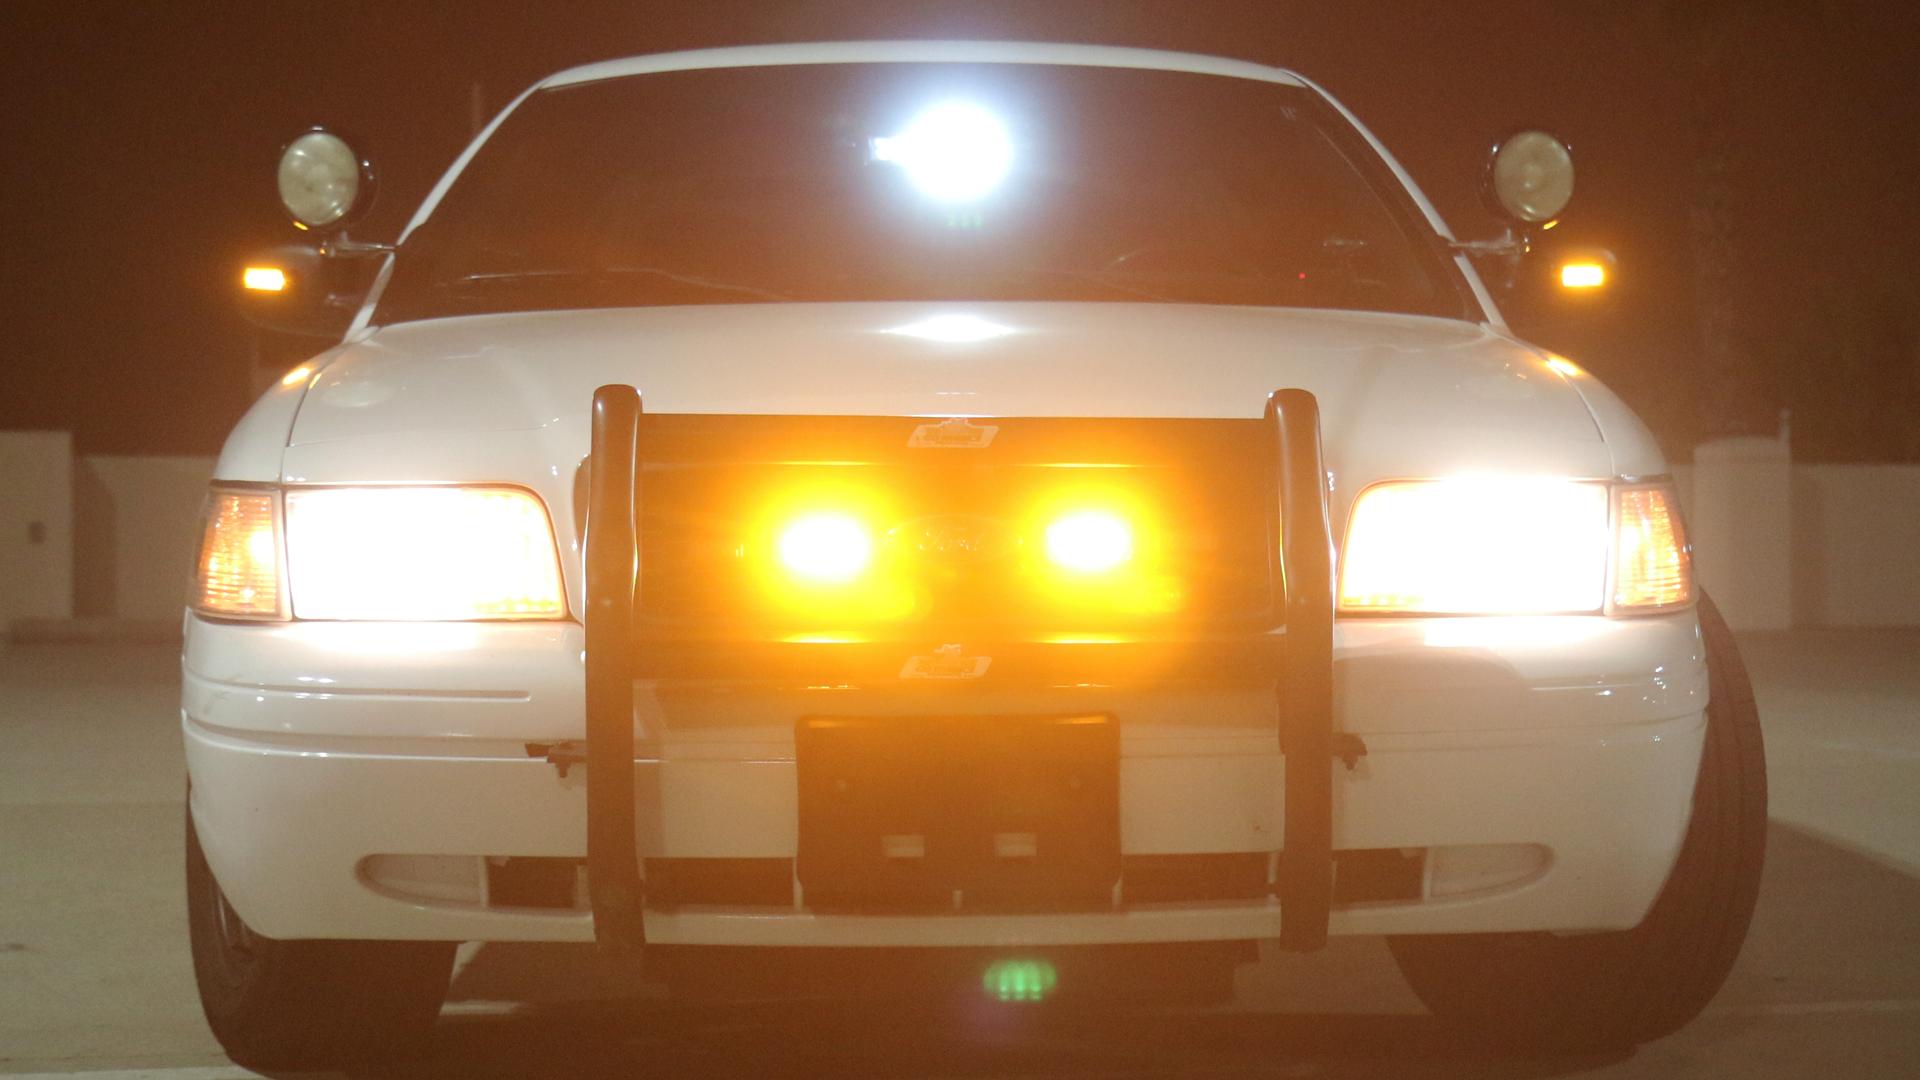 a88b598e6d6b7704b92882abd6d392607b7fd919?image_crop_resized=1920x1080 surface mount led emergency lights led light heads online led store fuse box at bakdesigns.co